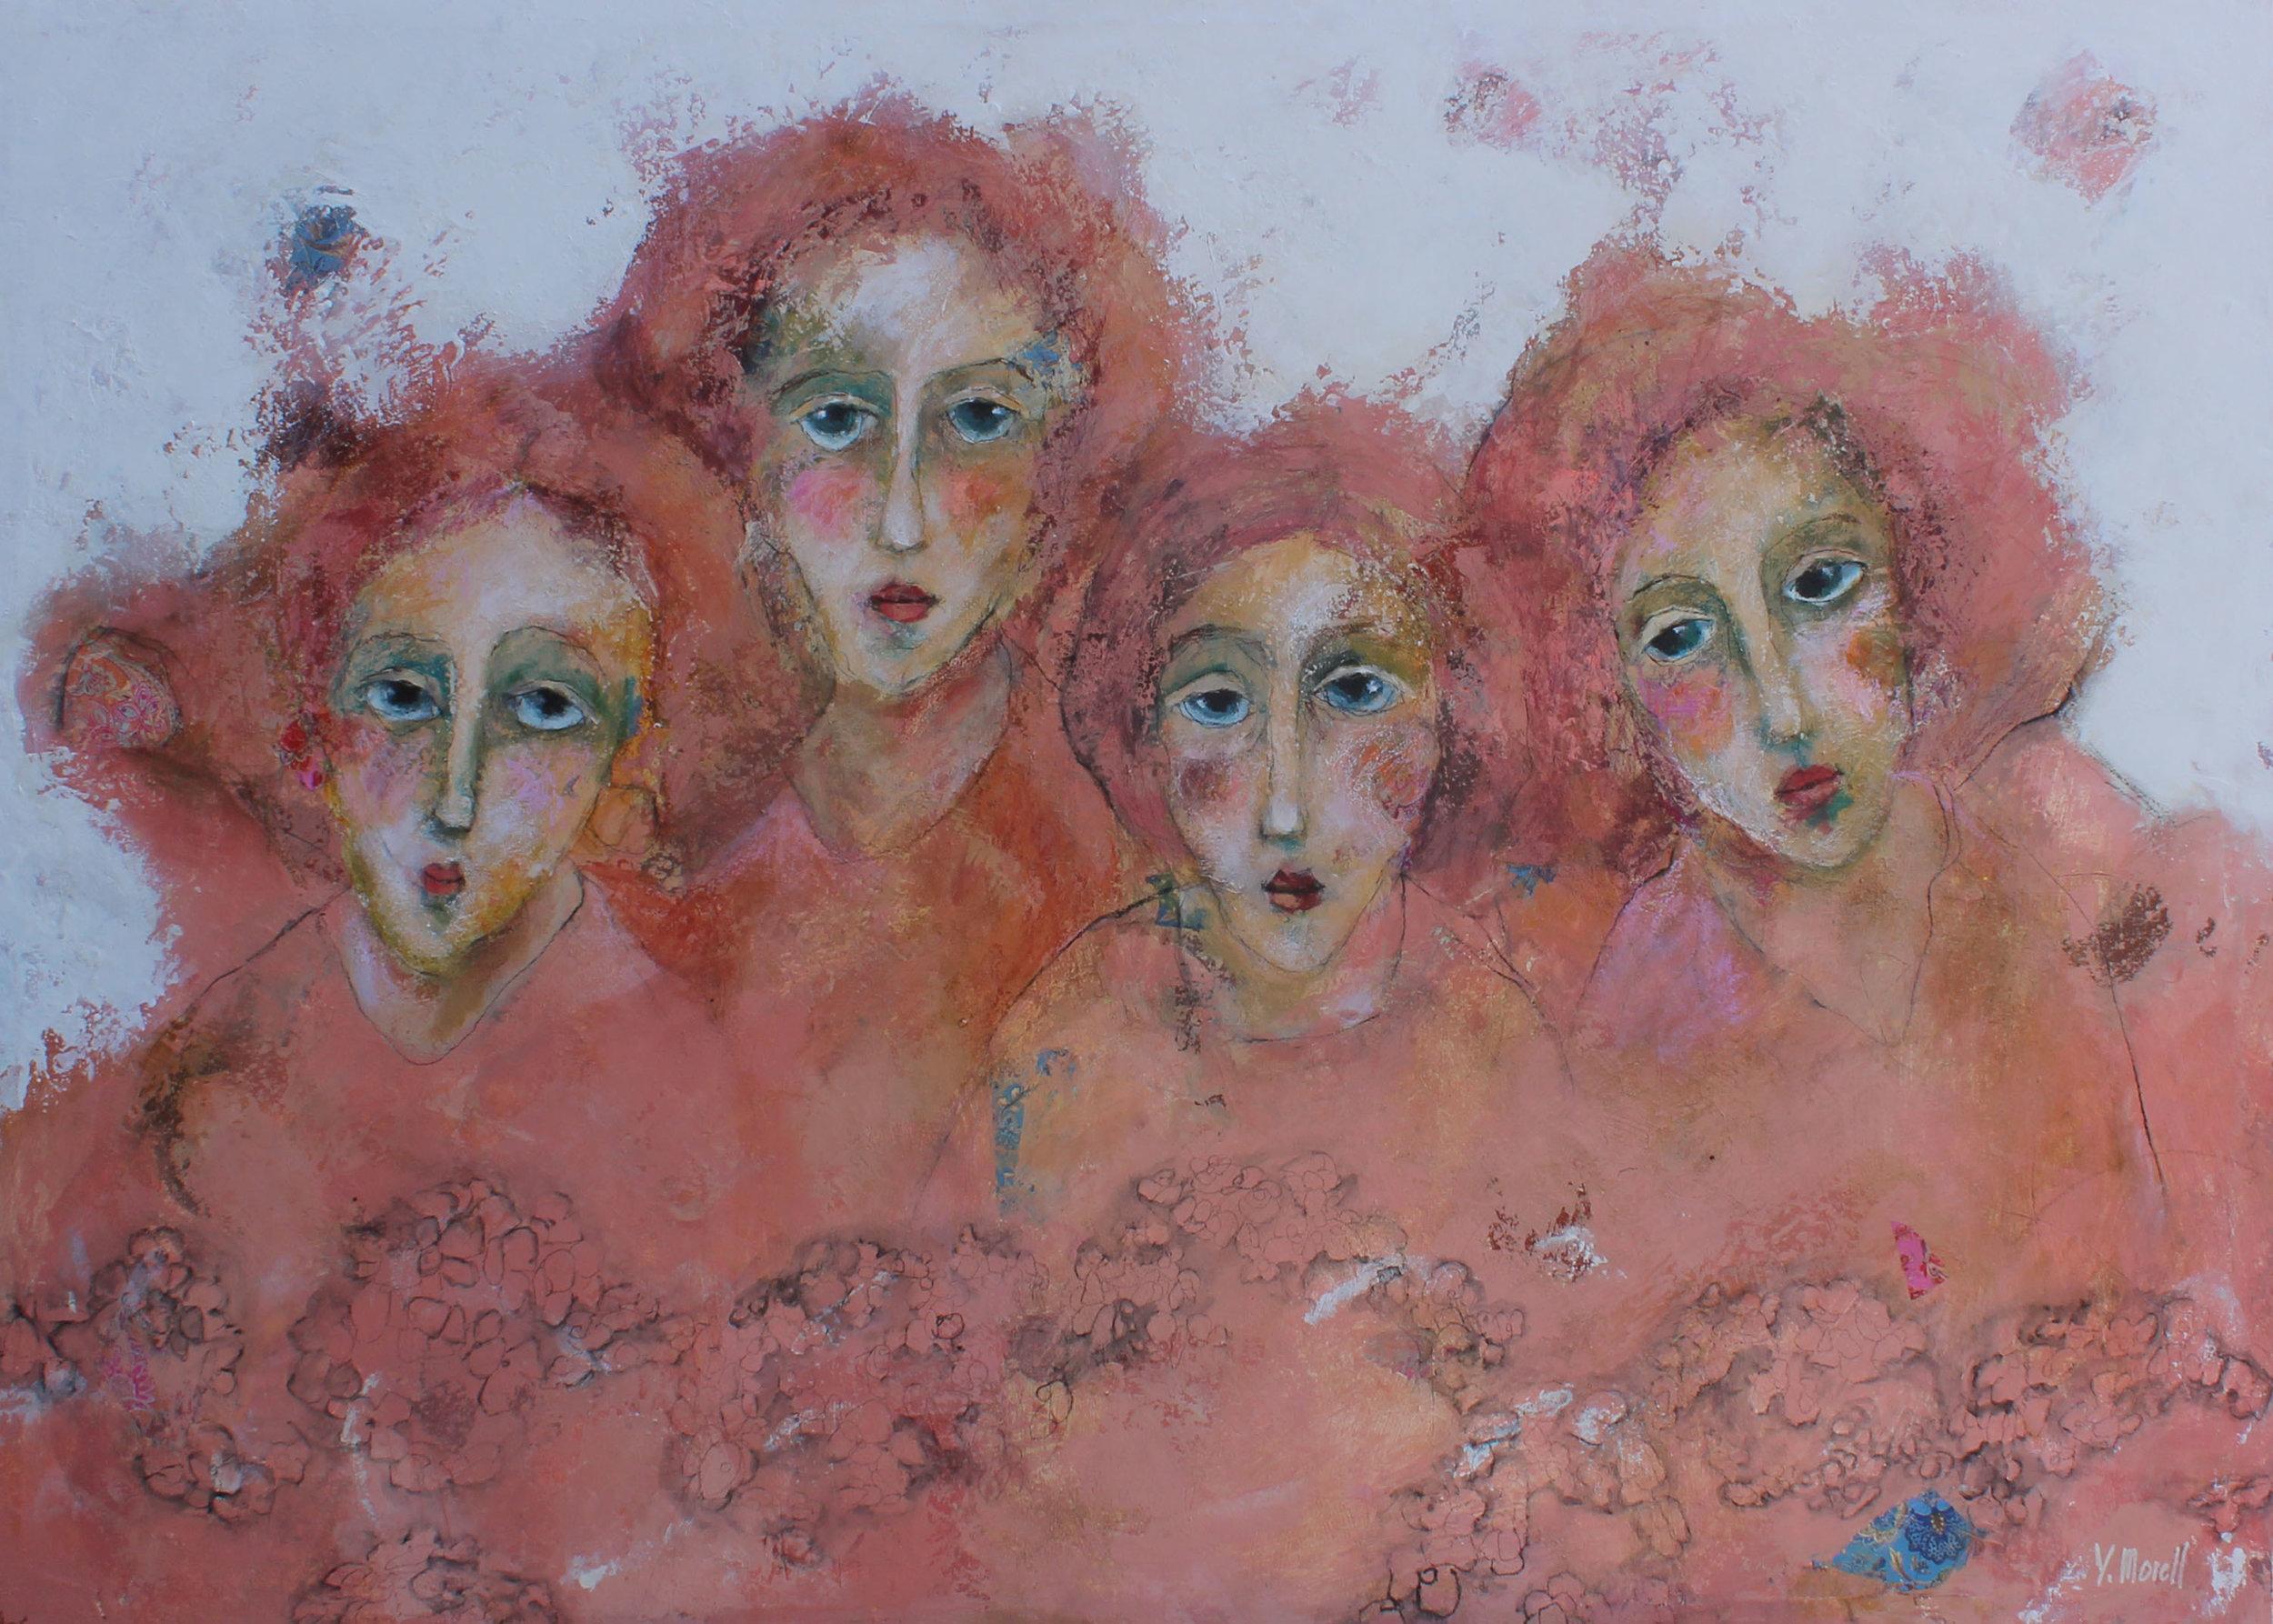 Vieux rose girls Yvonne Morell.jpg